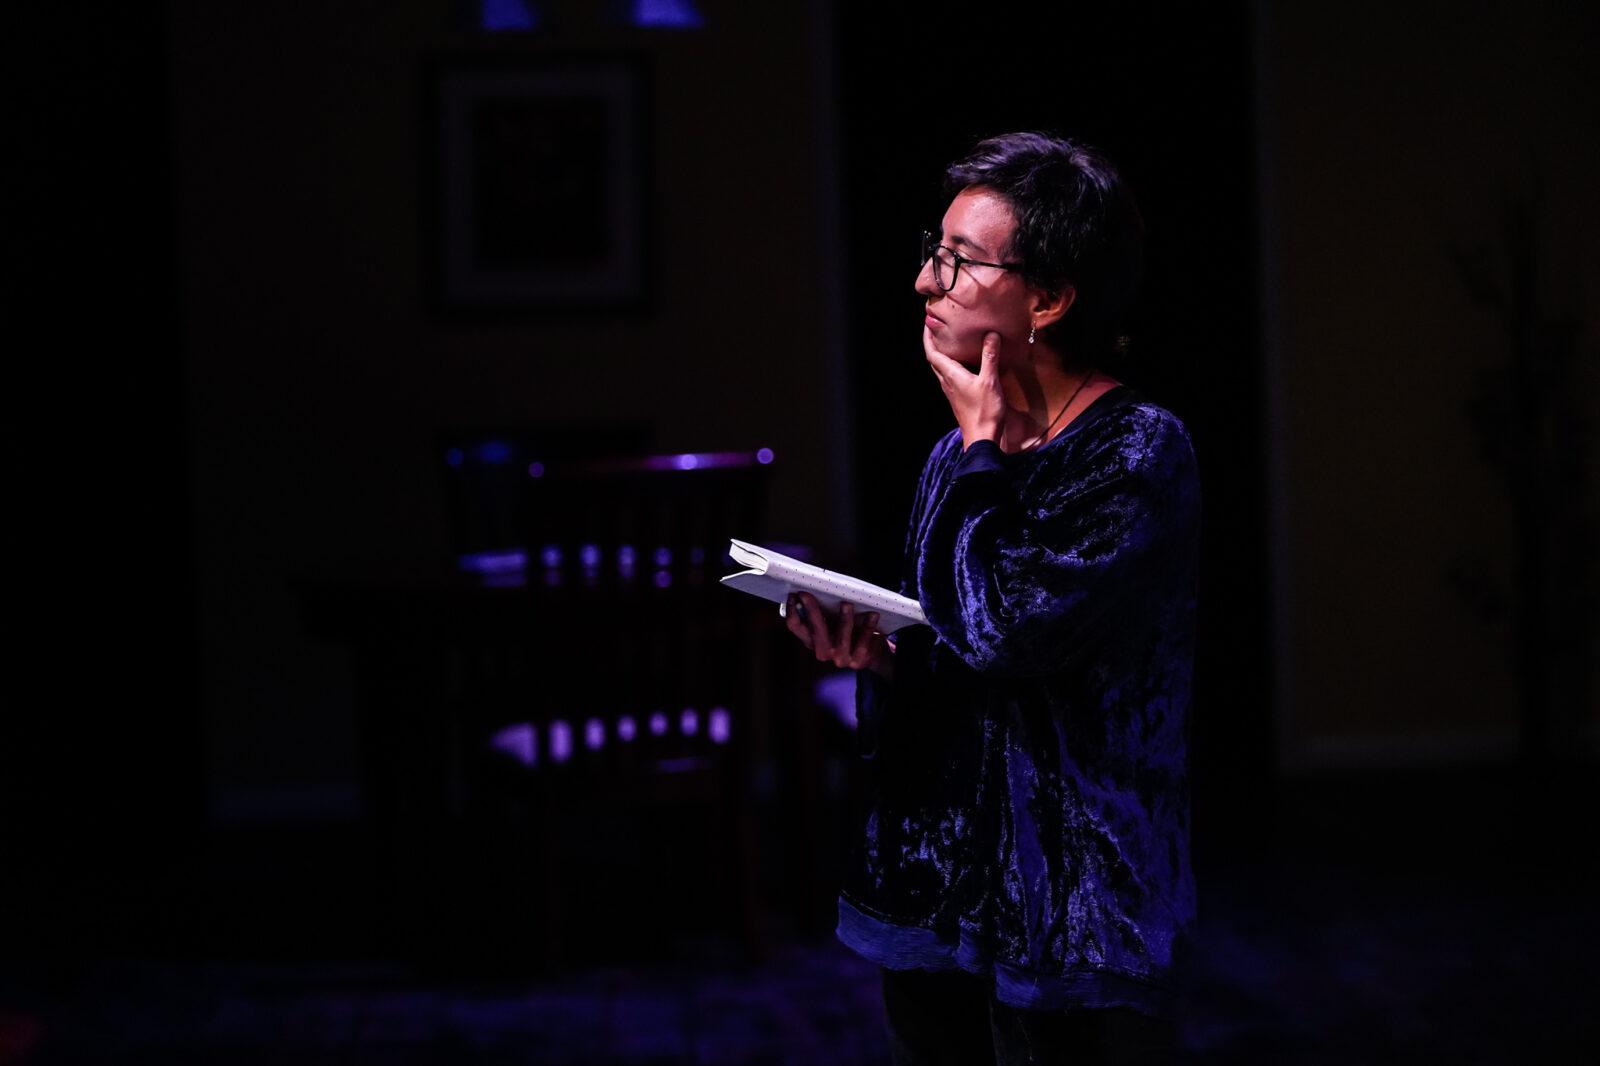 Performances by siri gurudev